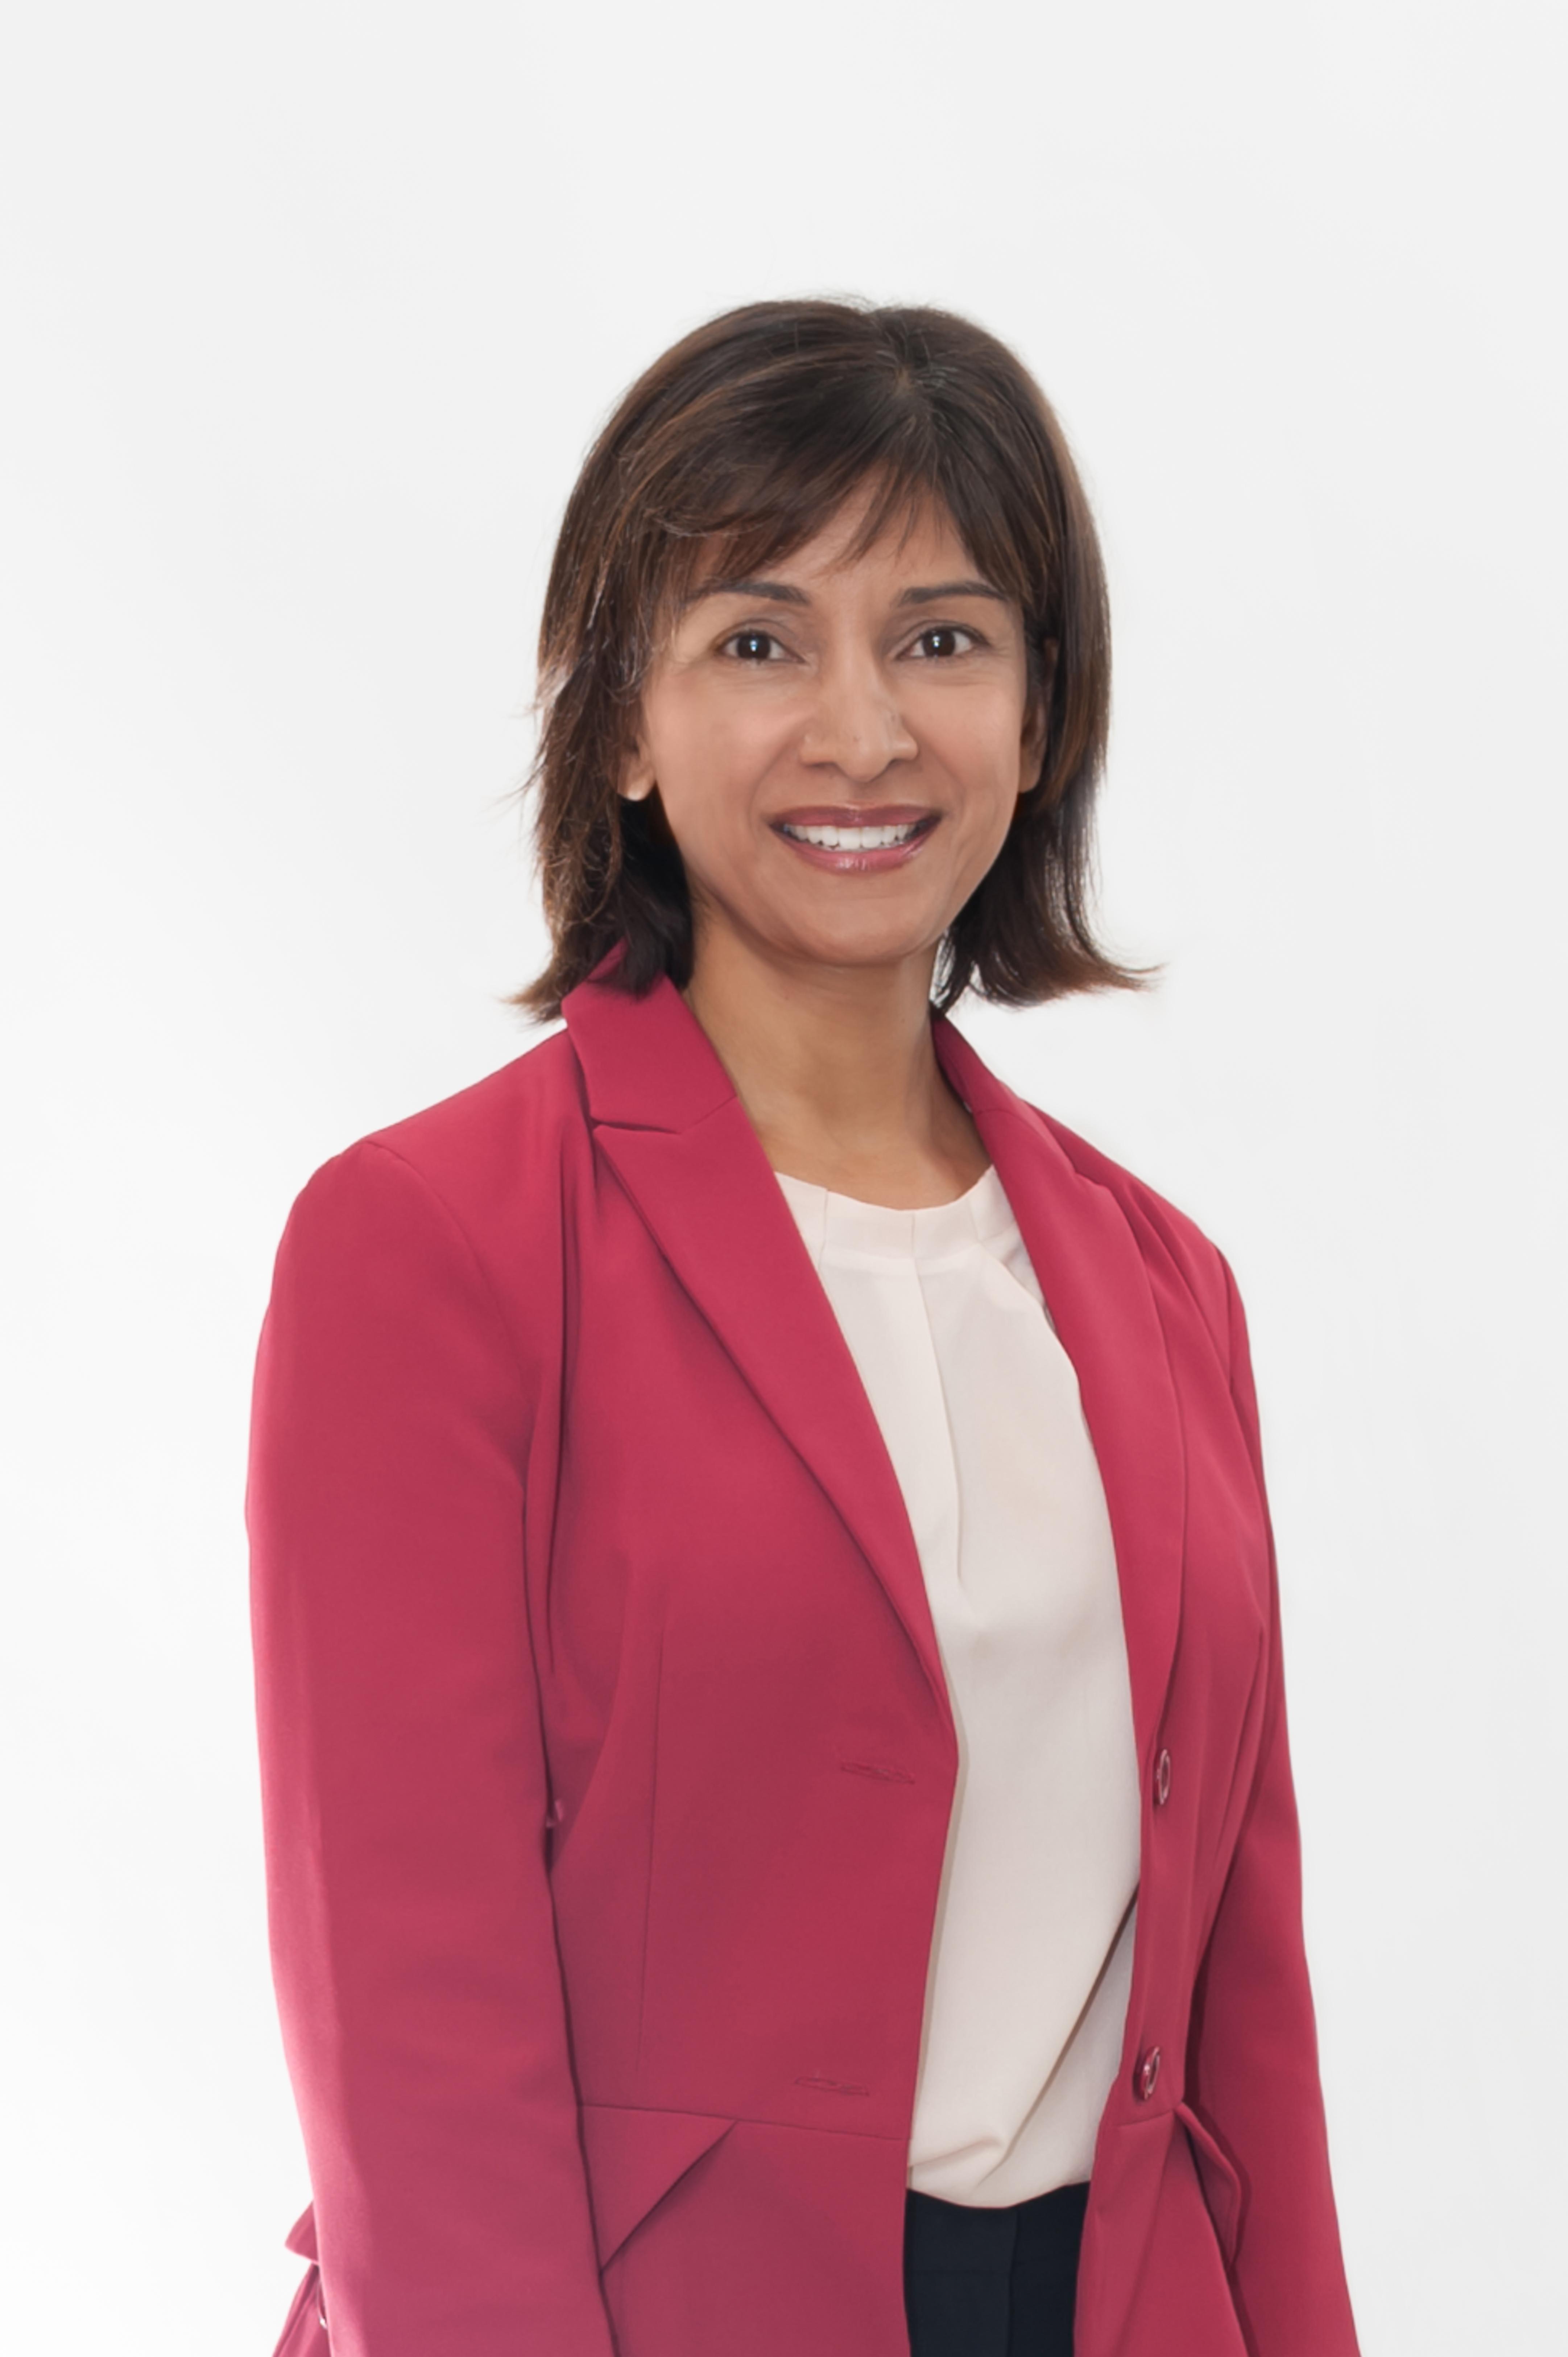 Ramona Sequeira, President of Takeda Pharmaceuticals' U.S. Business Unit